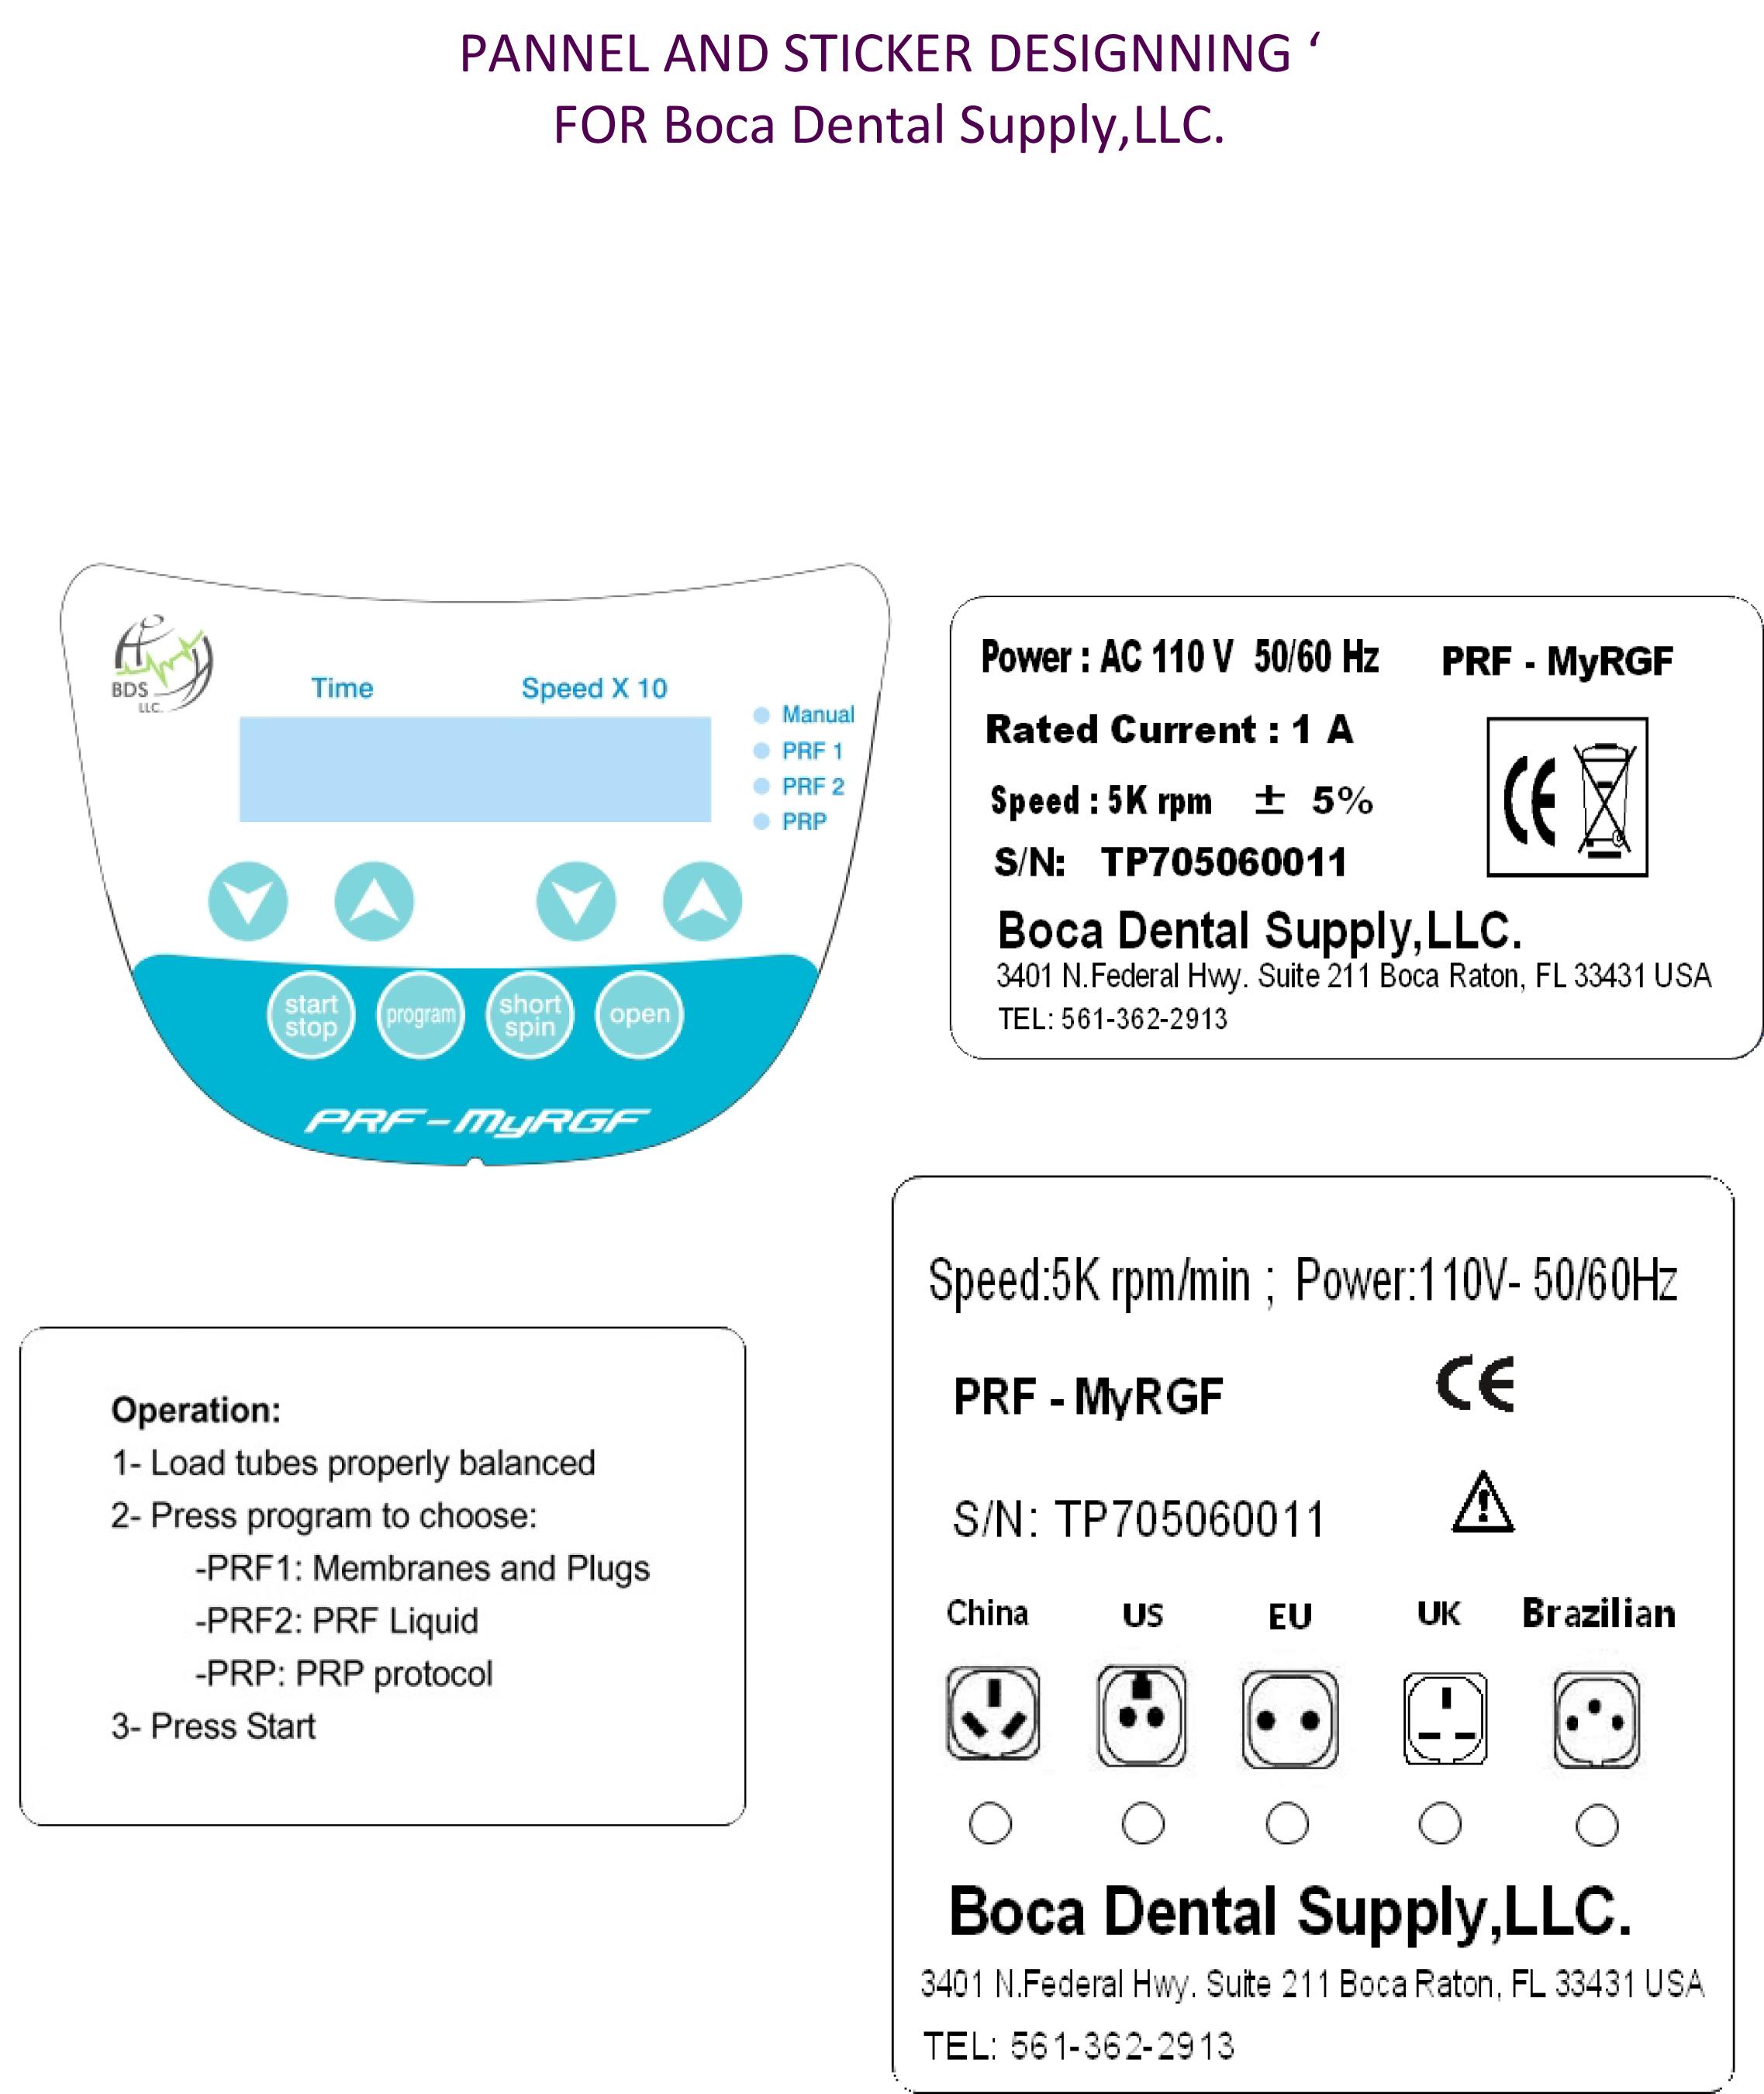 final-pannel-and-sticker-designning-boca-dental-sup.jpg